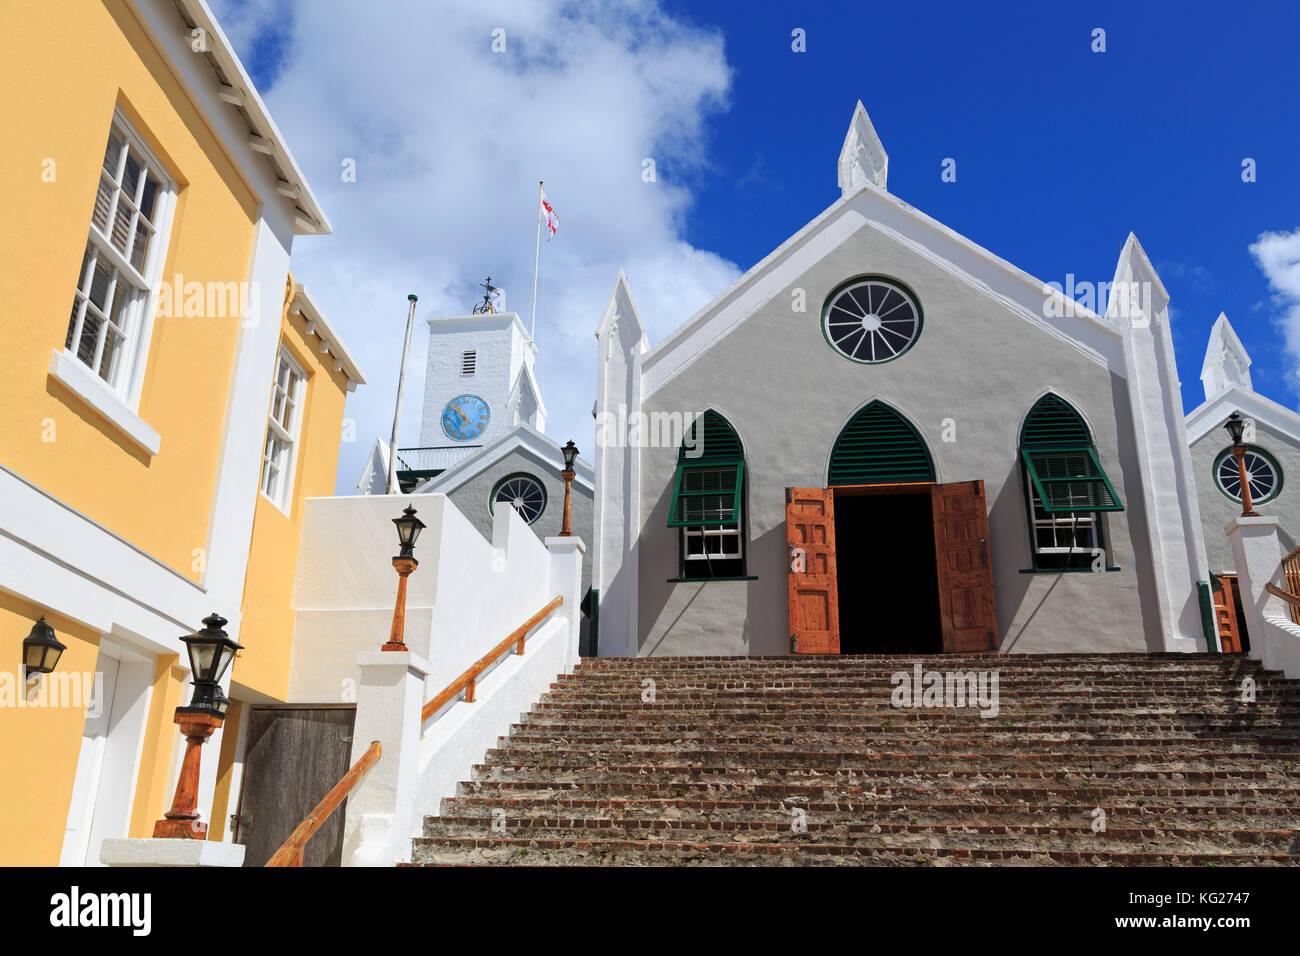 St.Peter Kirche, Stadt st. georg, St George's Parish, Bermuda, Mittelamerika Stockbild